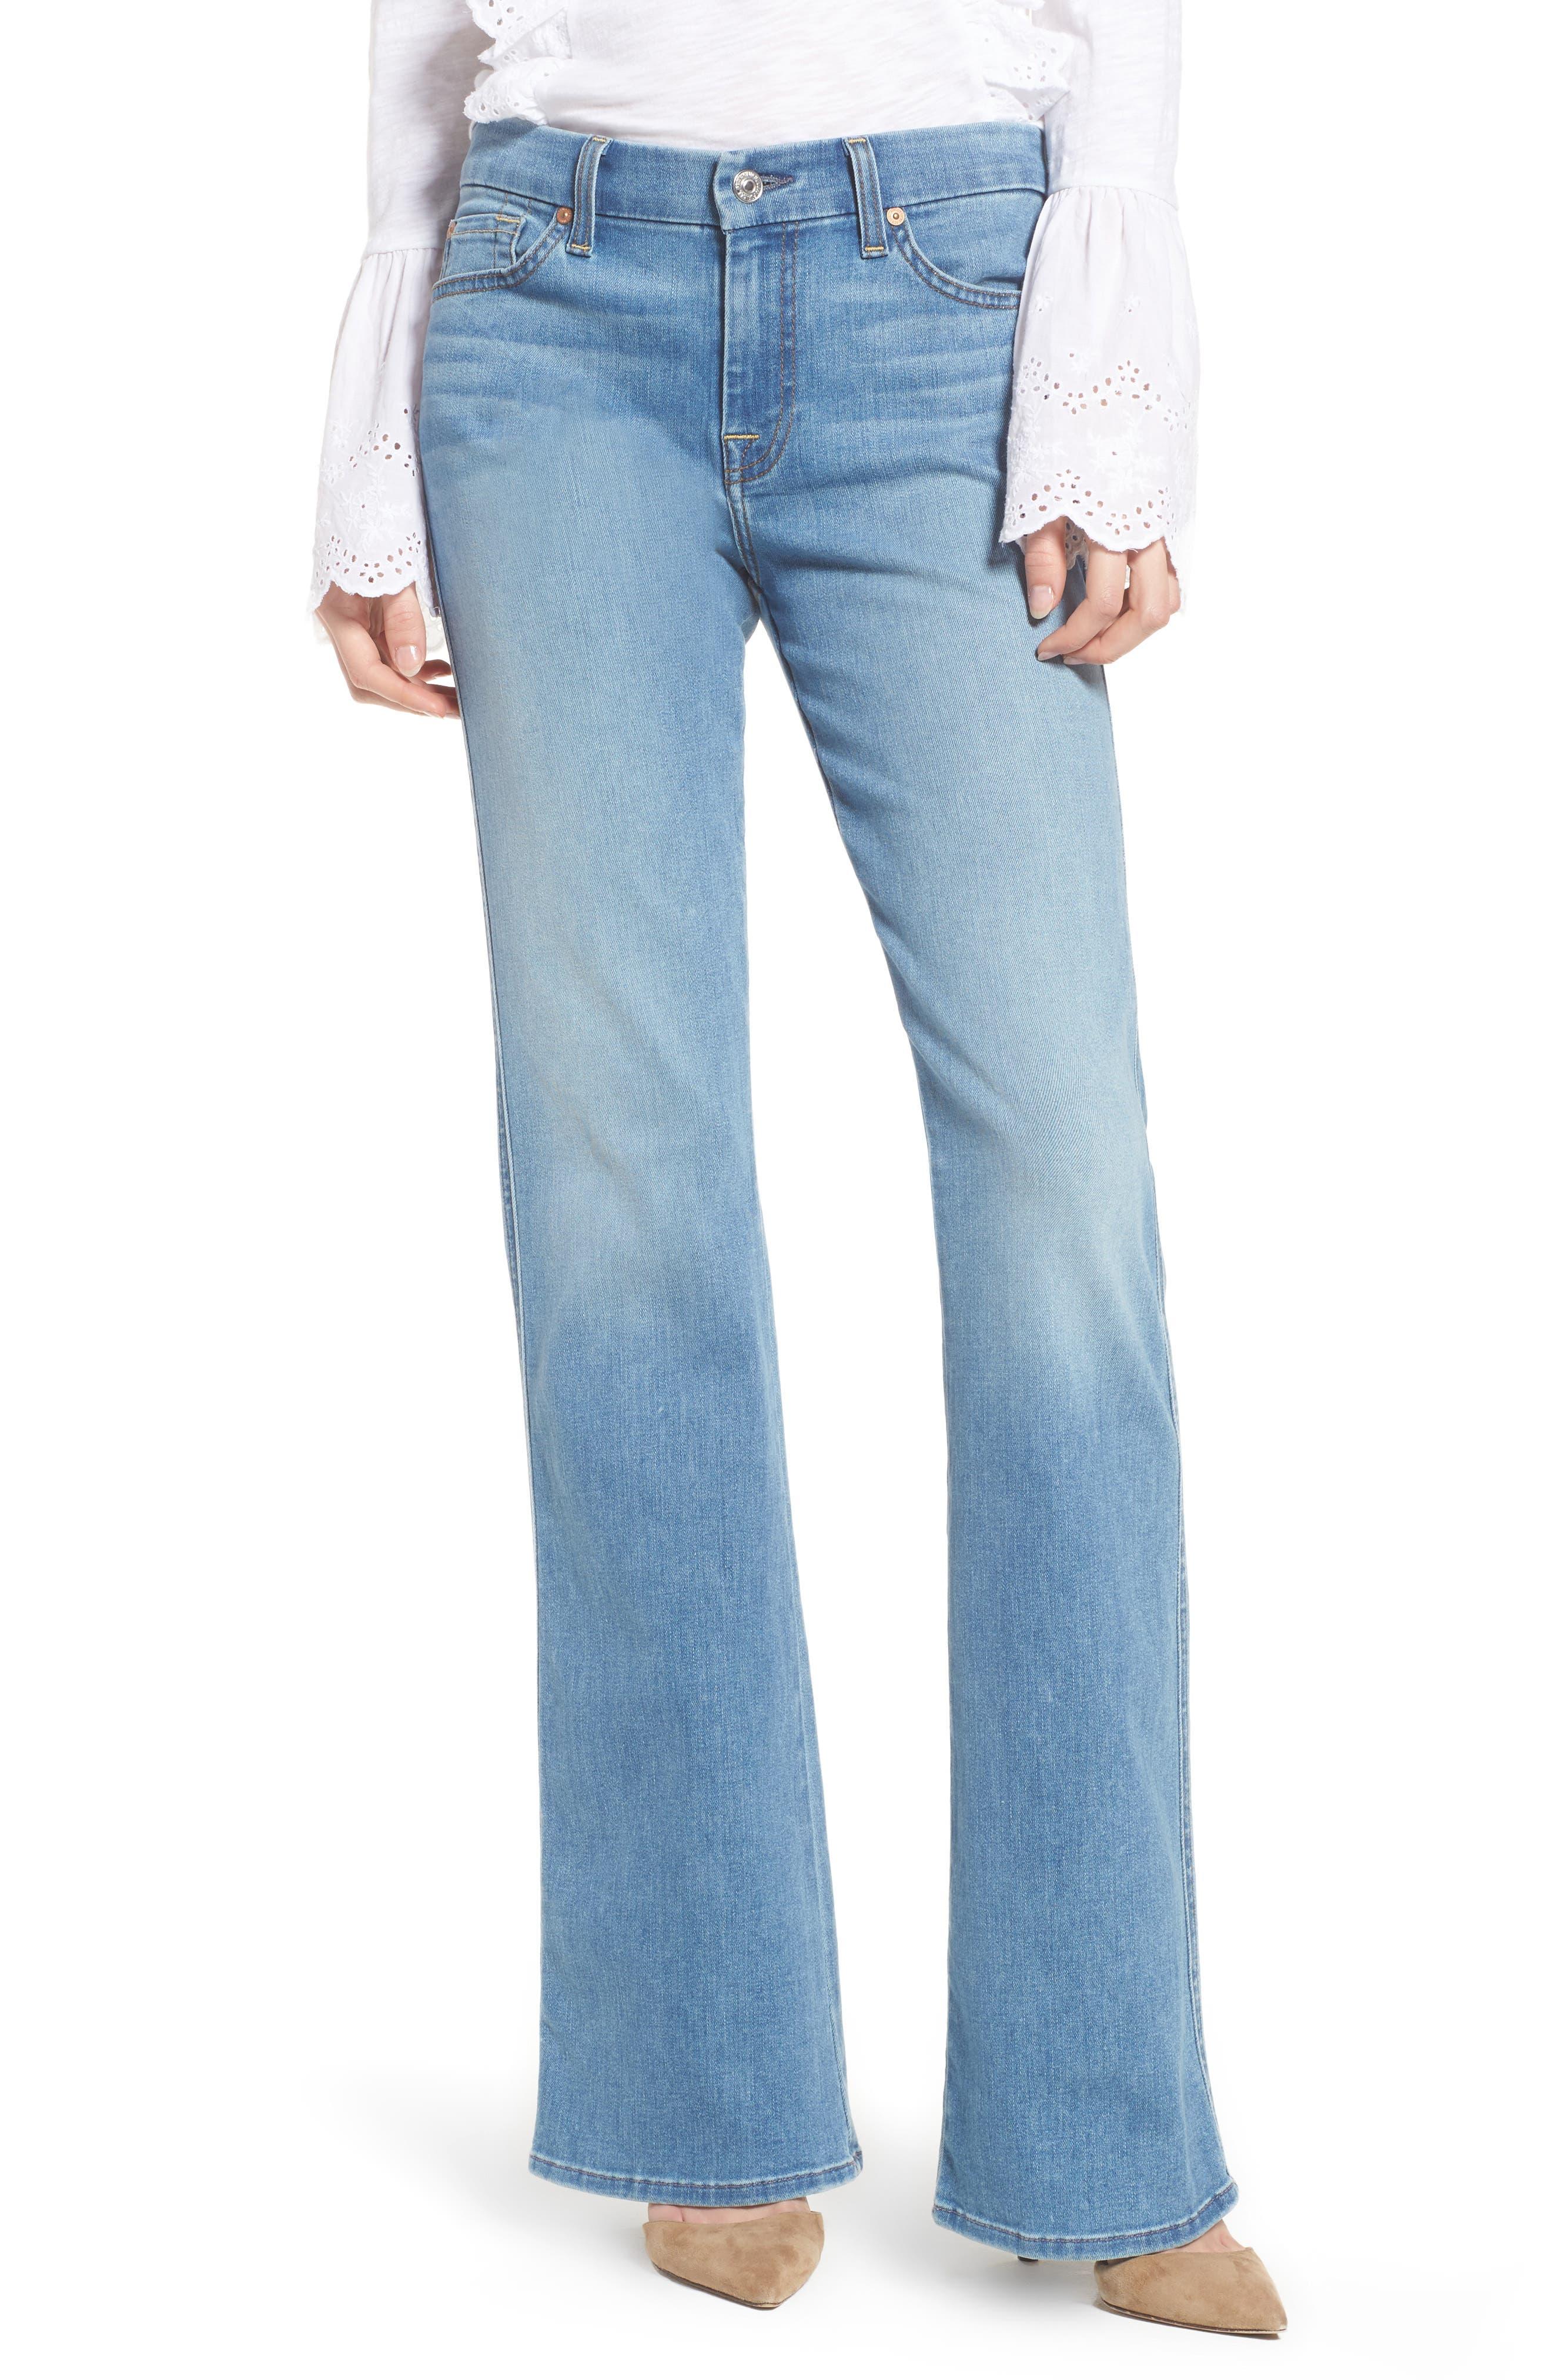 A-Pocket Flare Leg Jeans,                             Main thumbnail 1, color,                             401